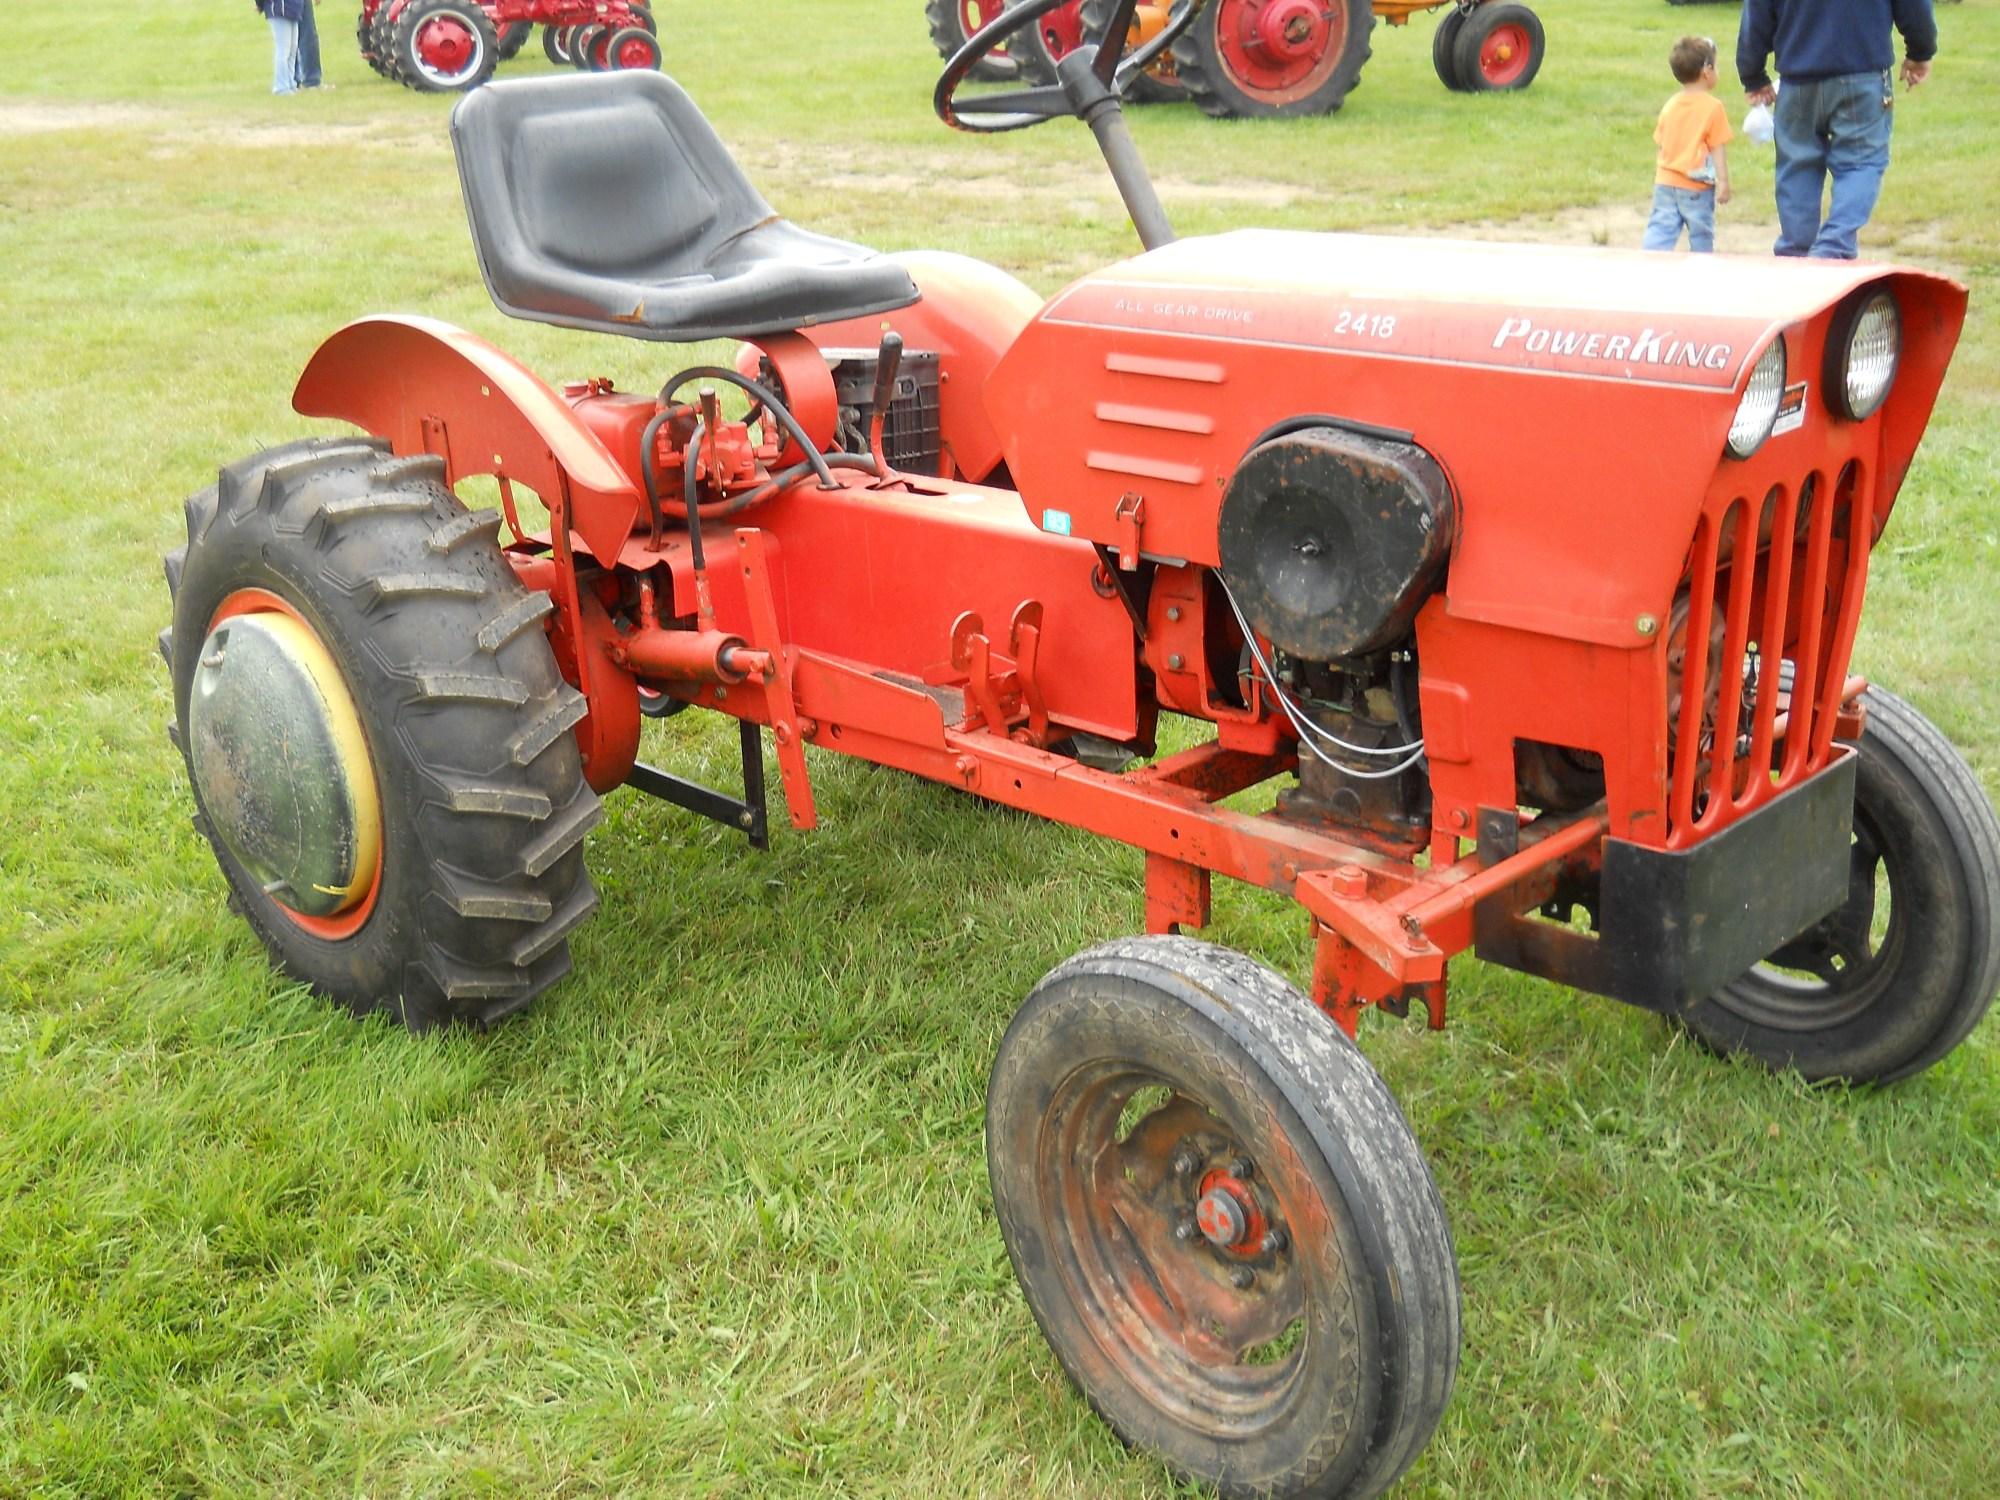 hight resolution of yard tractors garden equipment homemade forward power king 2418 all